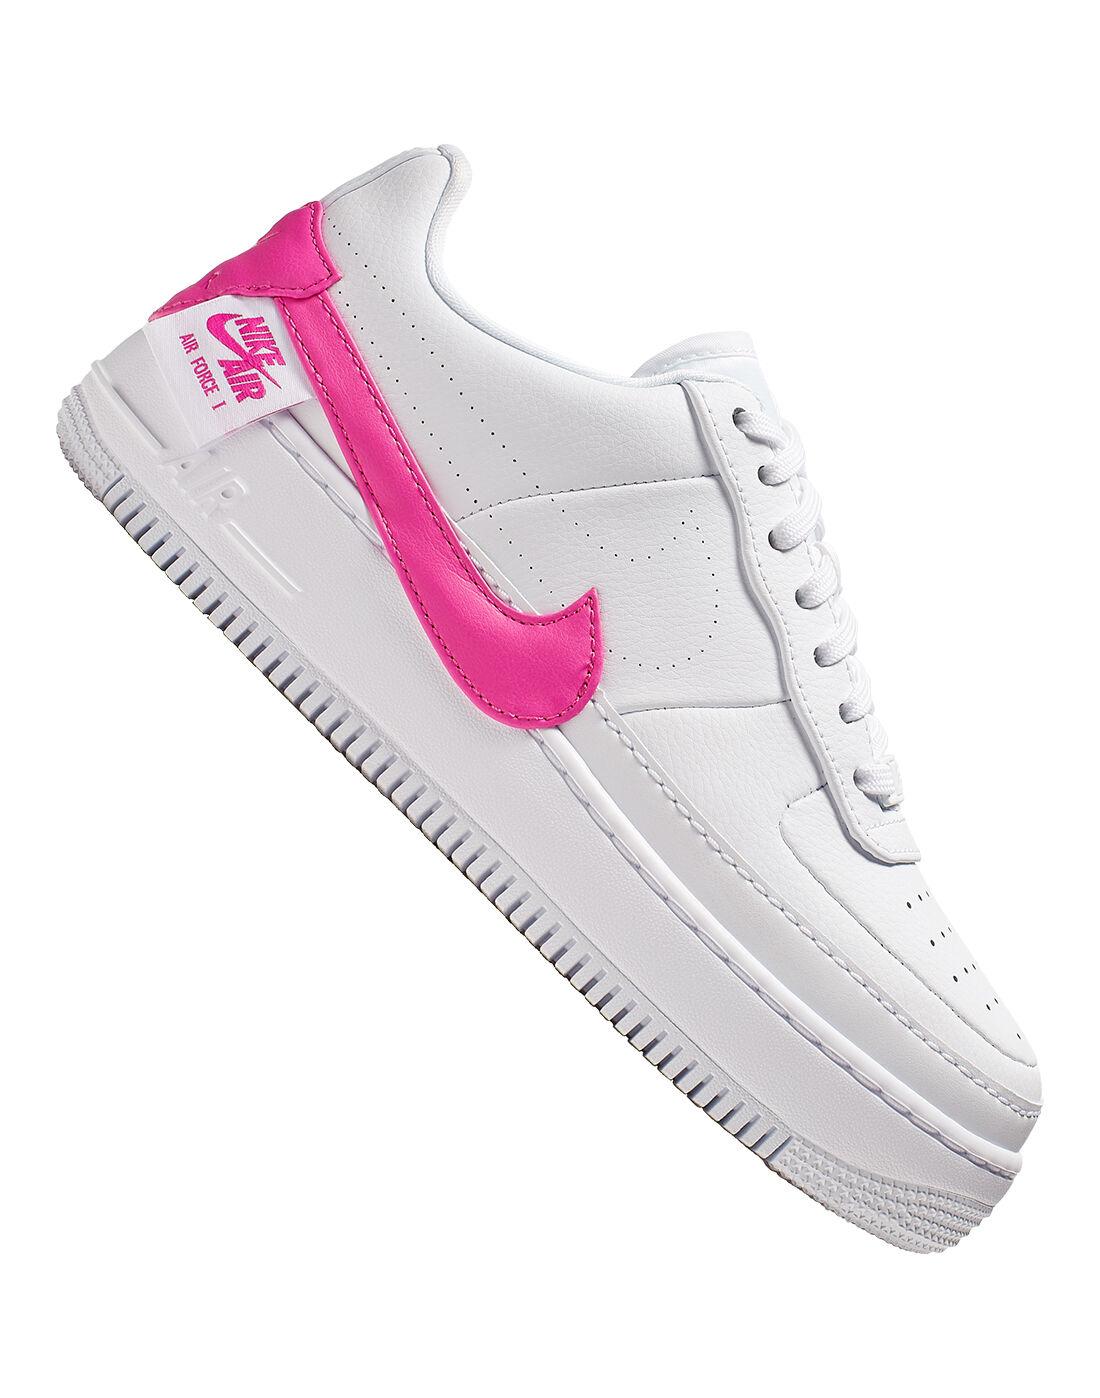 White \u0026 Pink Nike Air Force 1 Jester